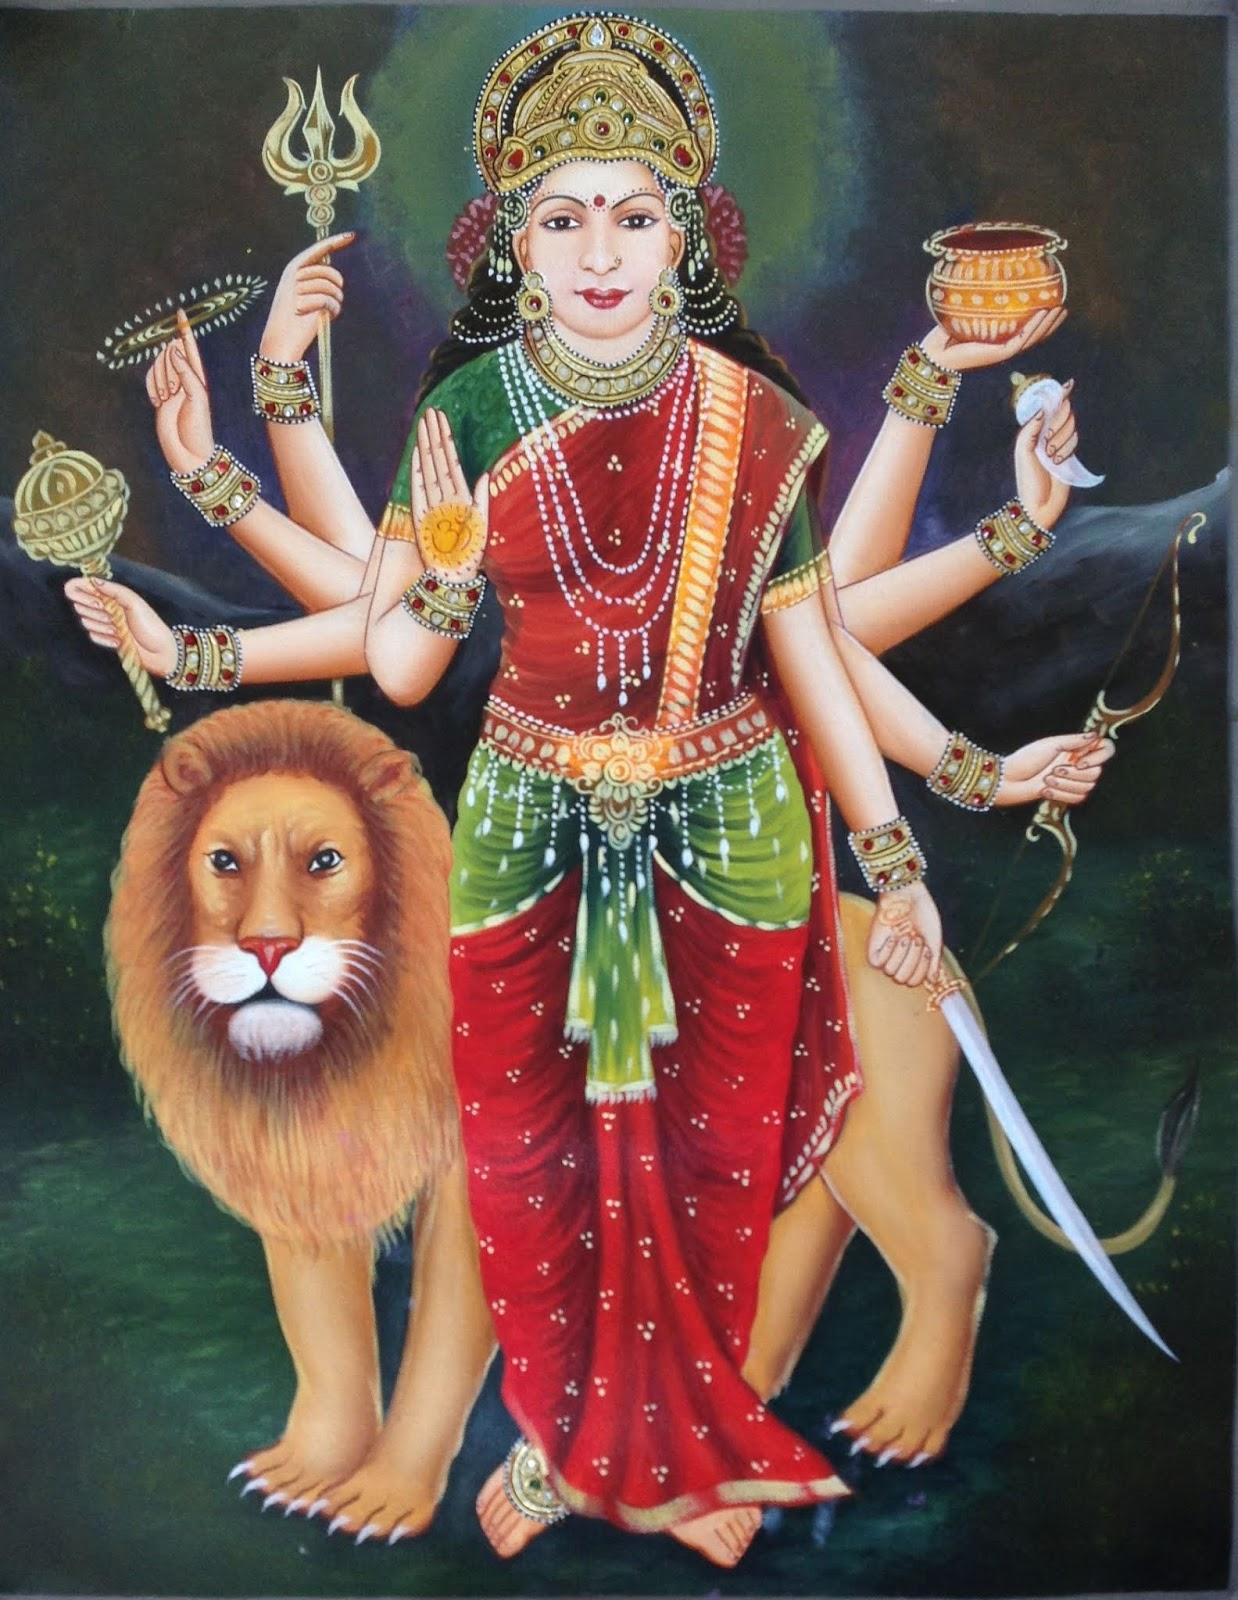 280 Maa Durga Hd Images Devi Wallpapers 2021 Full Size Photos म द र ग क फ ट जन म ष टम 2021